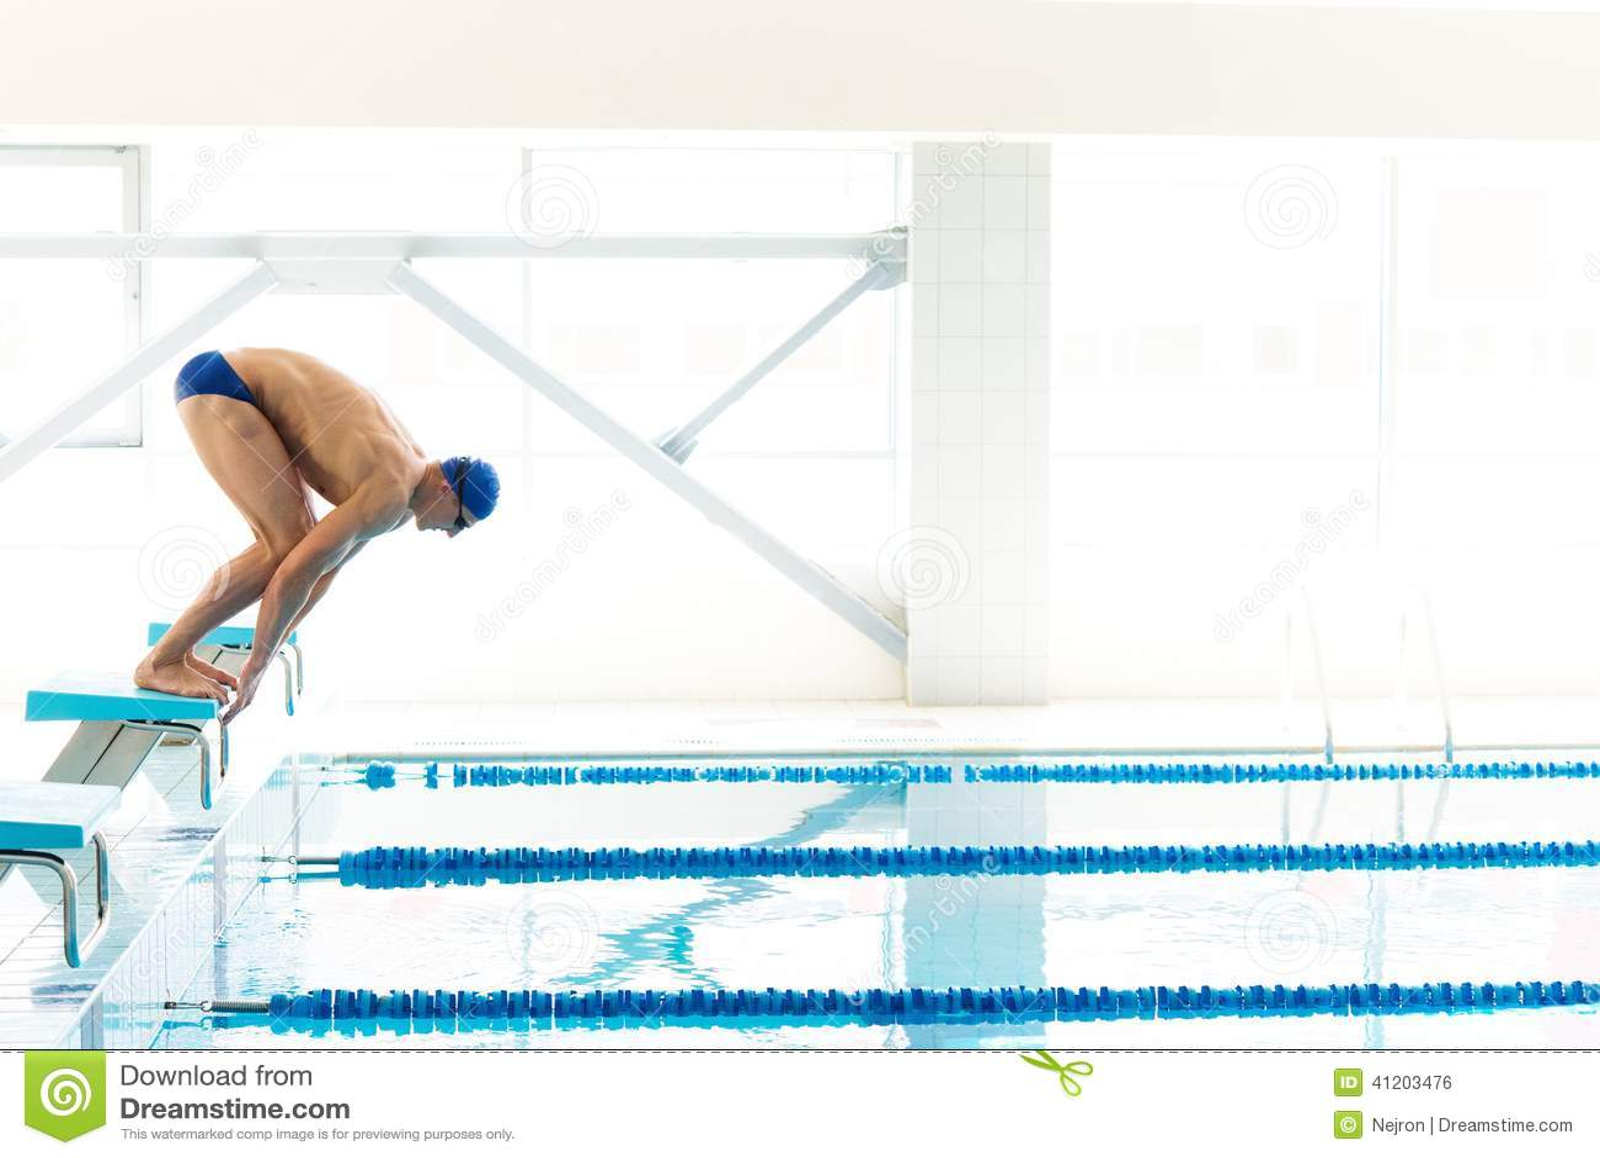 Swimmer jumping from starting block i stock photo image 41203476 - Olympic swimming starting blocks ...